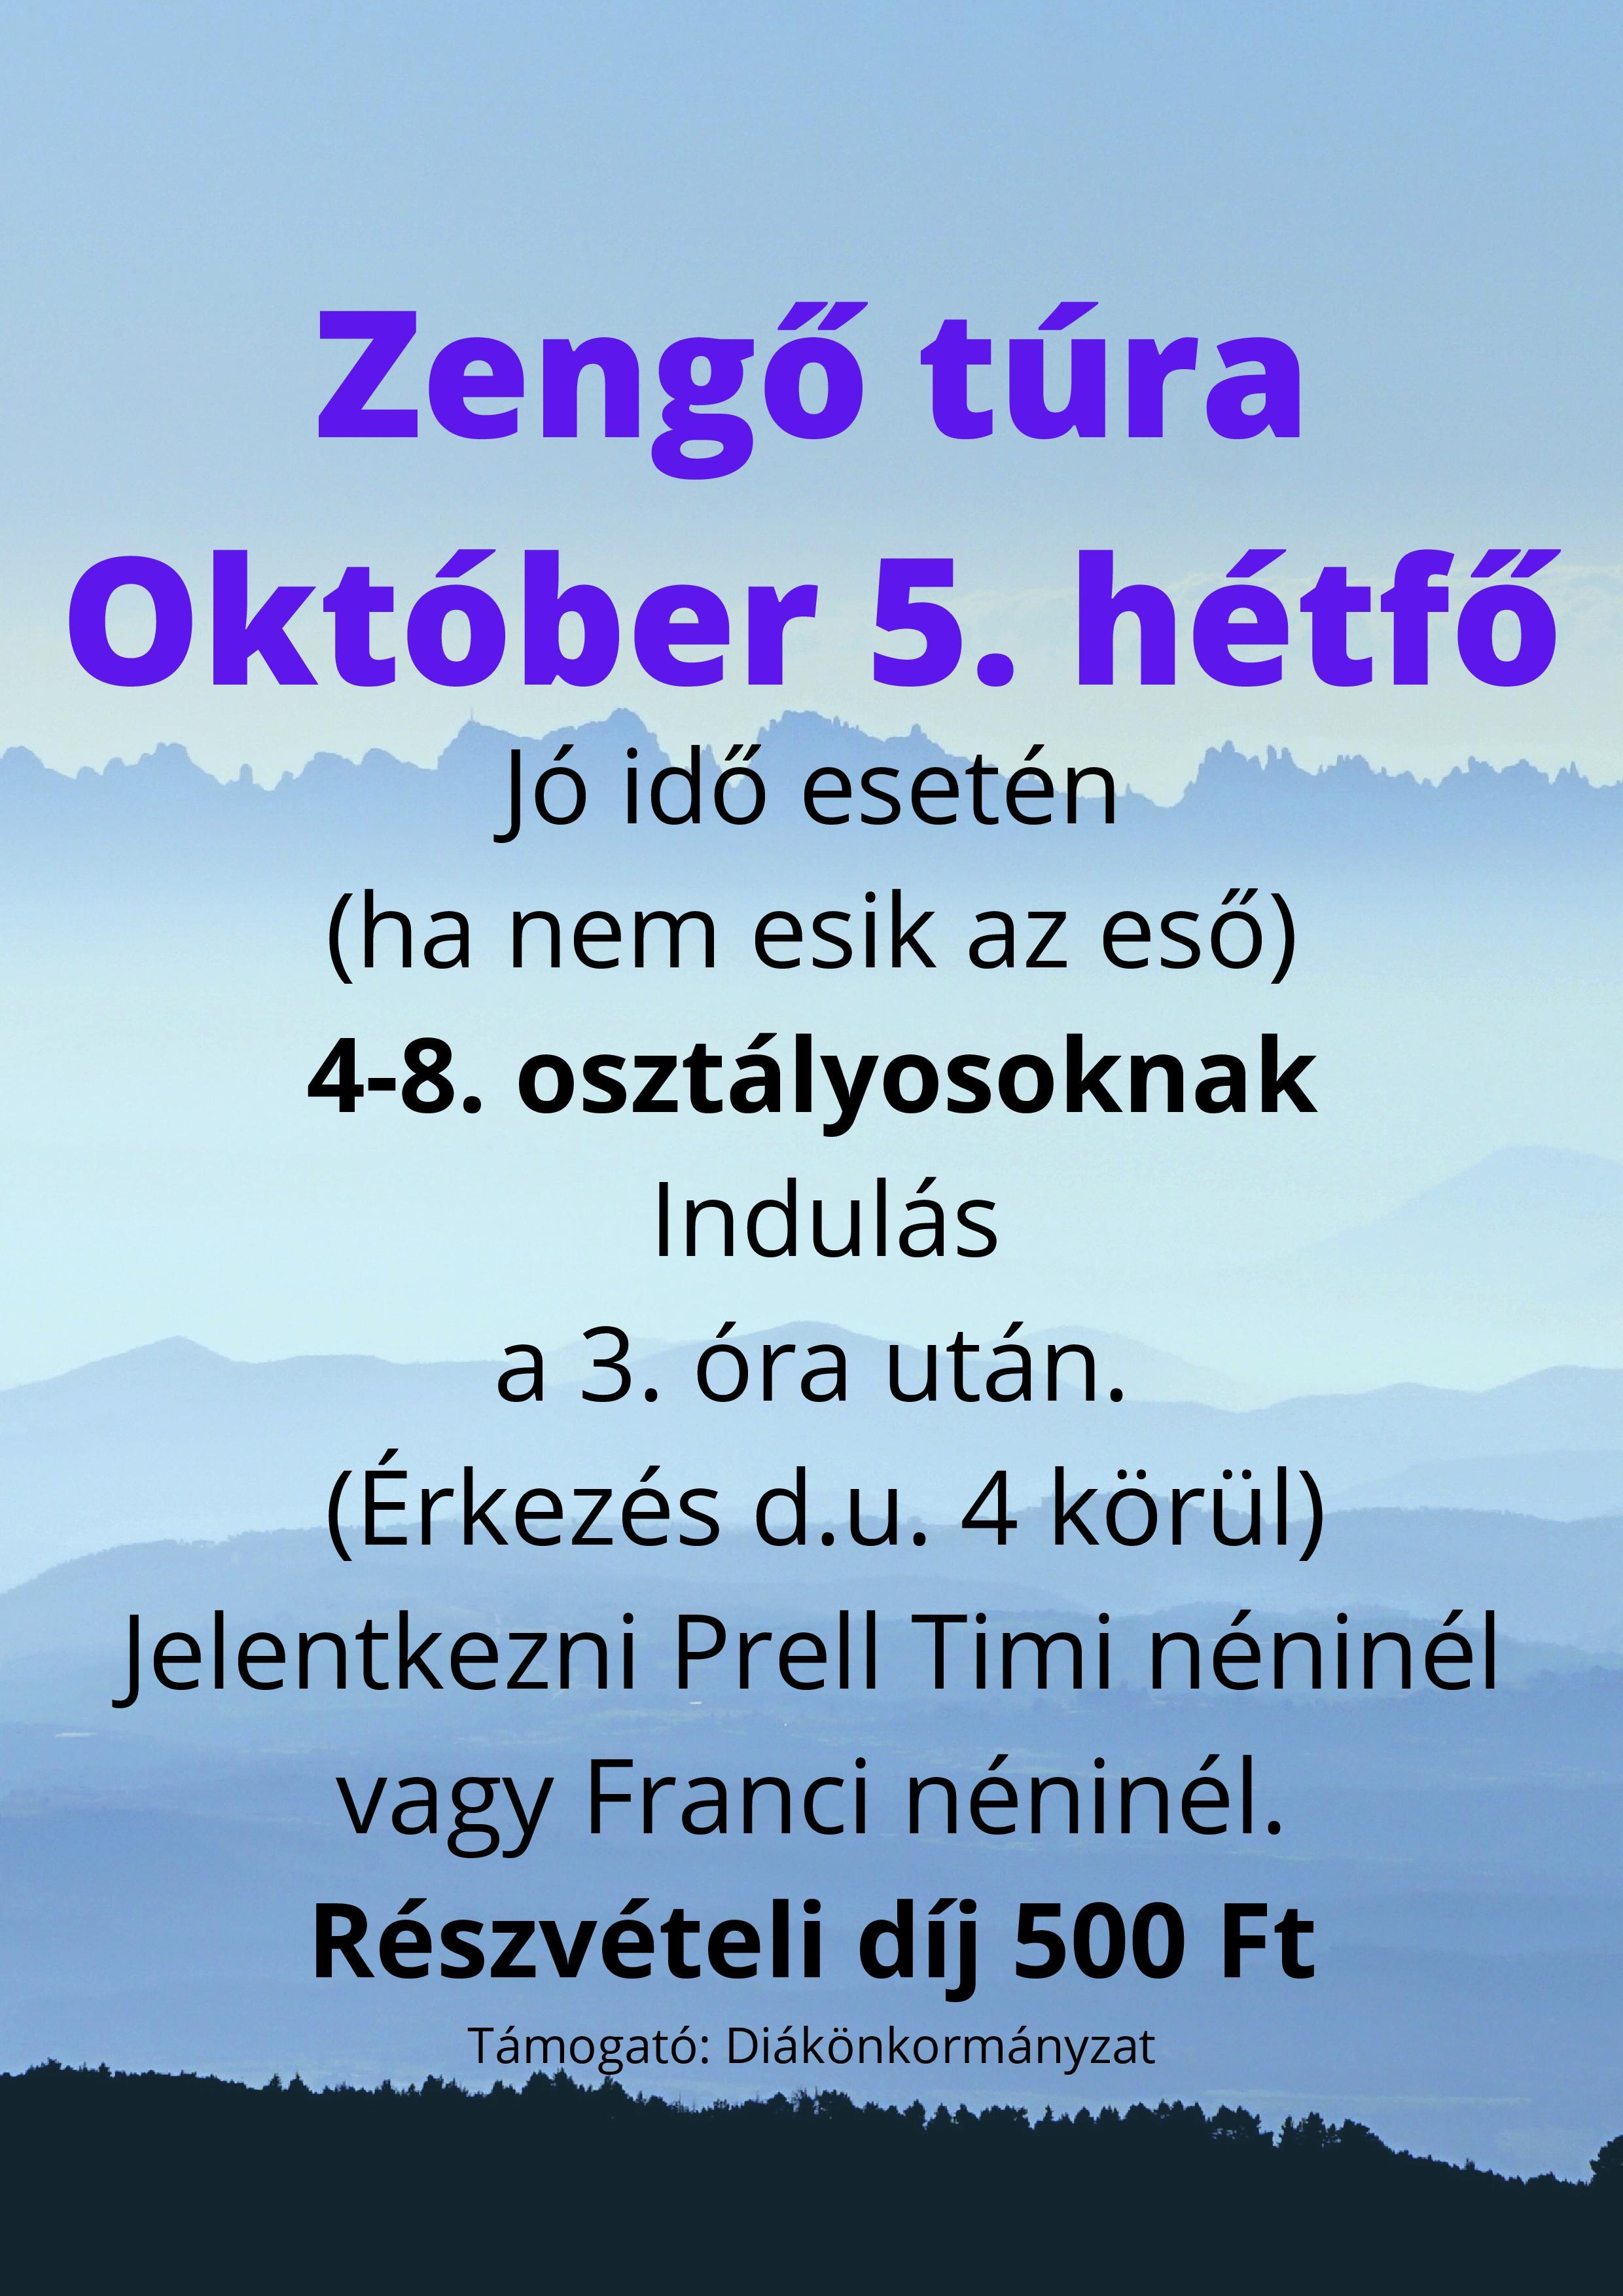 Zengő-túra-Október-5--hétfő (1)-page-001